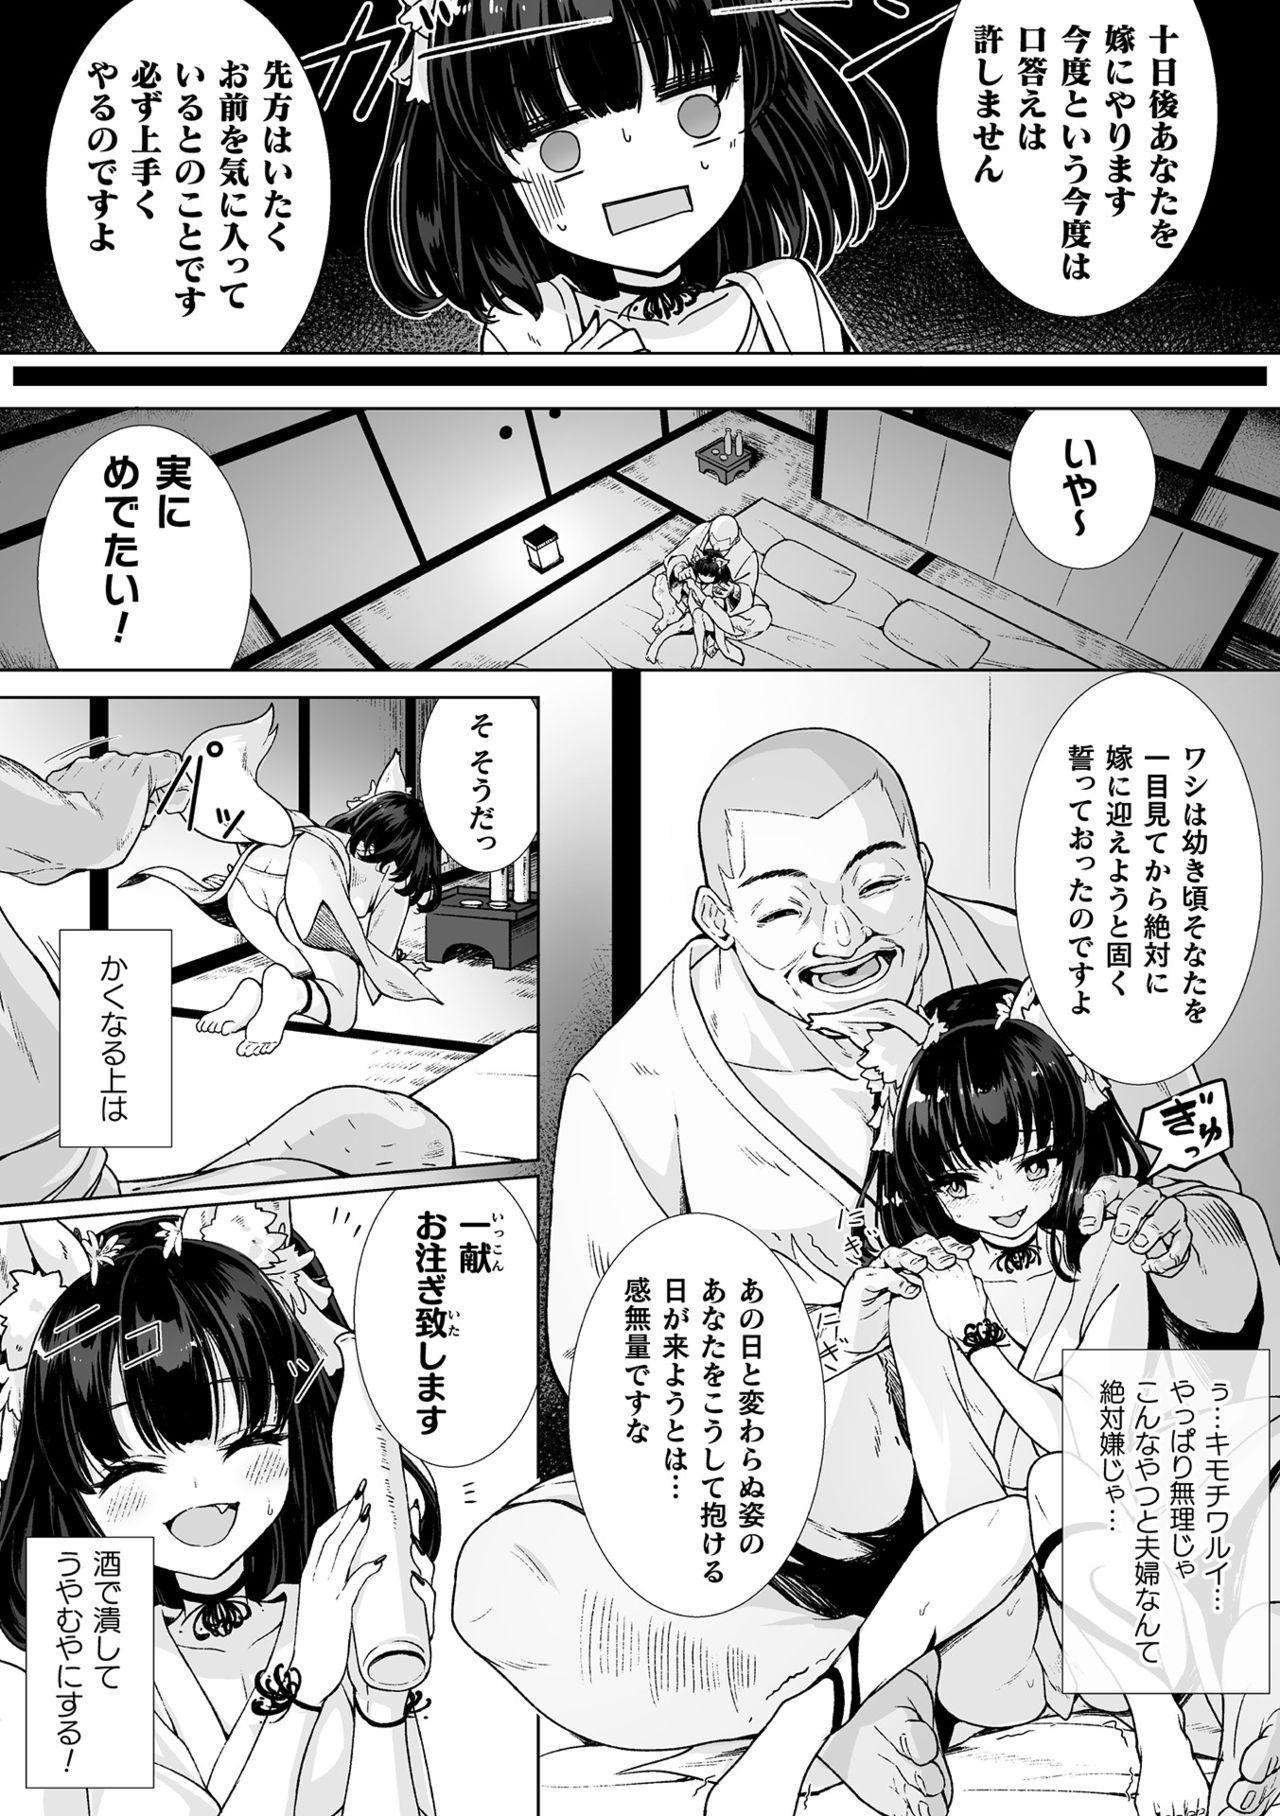 Loli-babaa Kyousei Tanetsuke Ecchi! Vol. 2 4